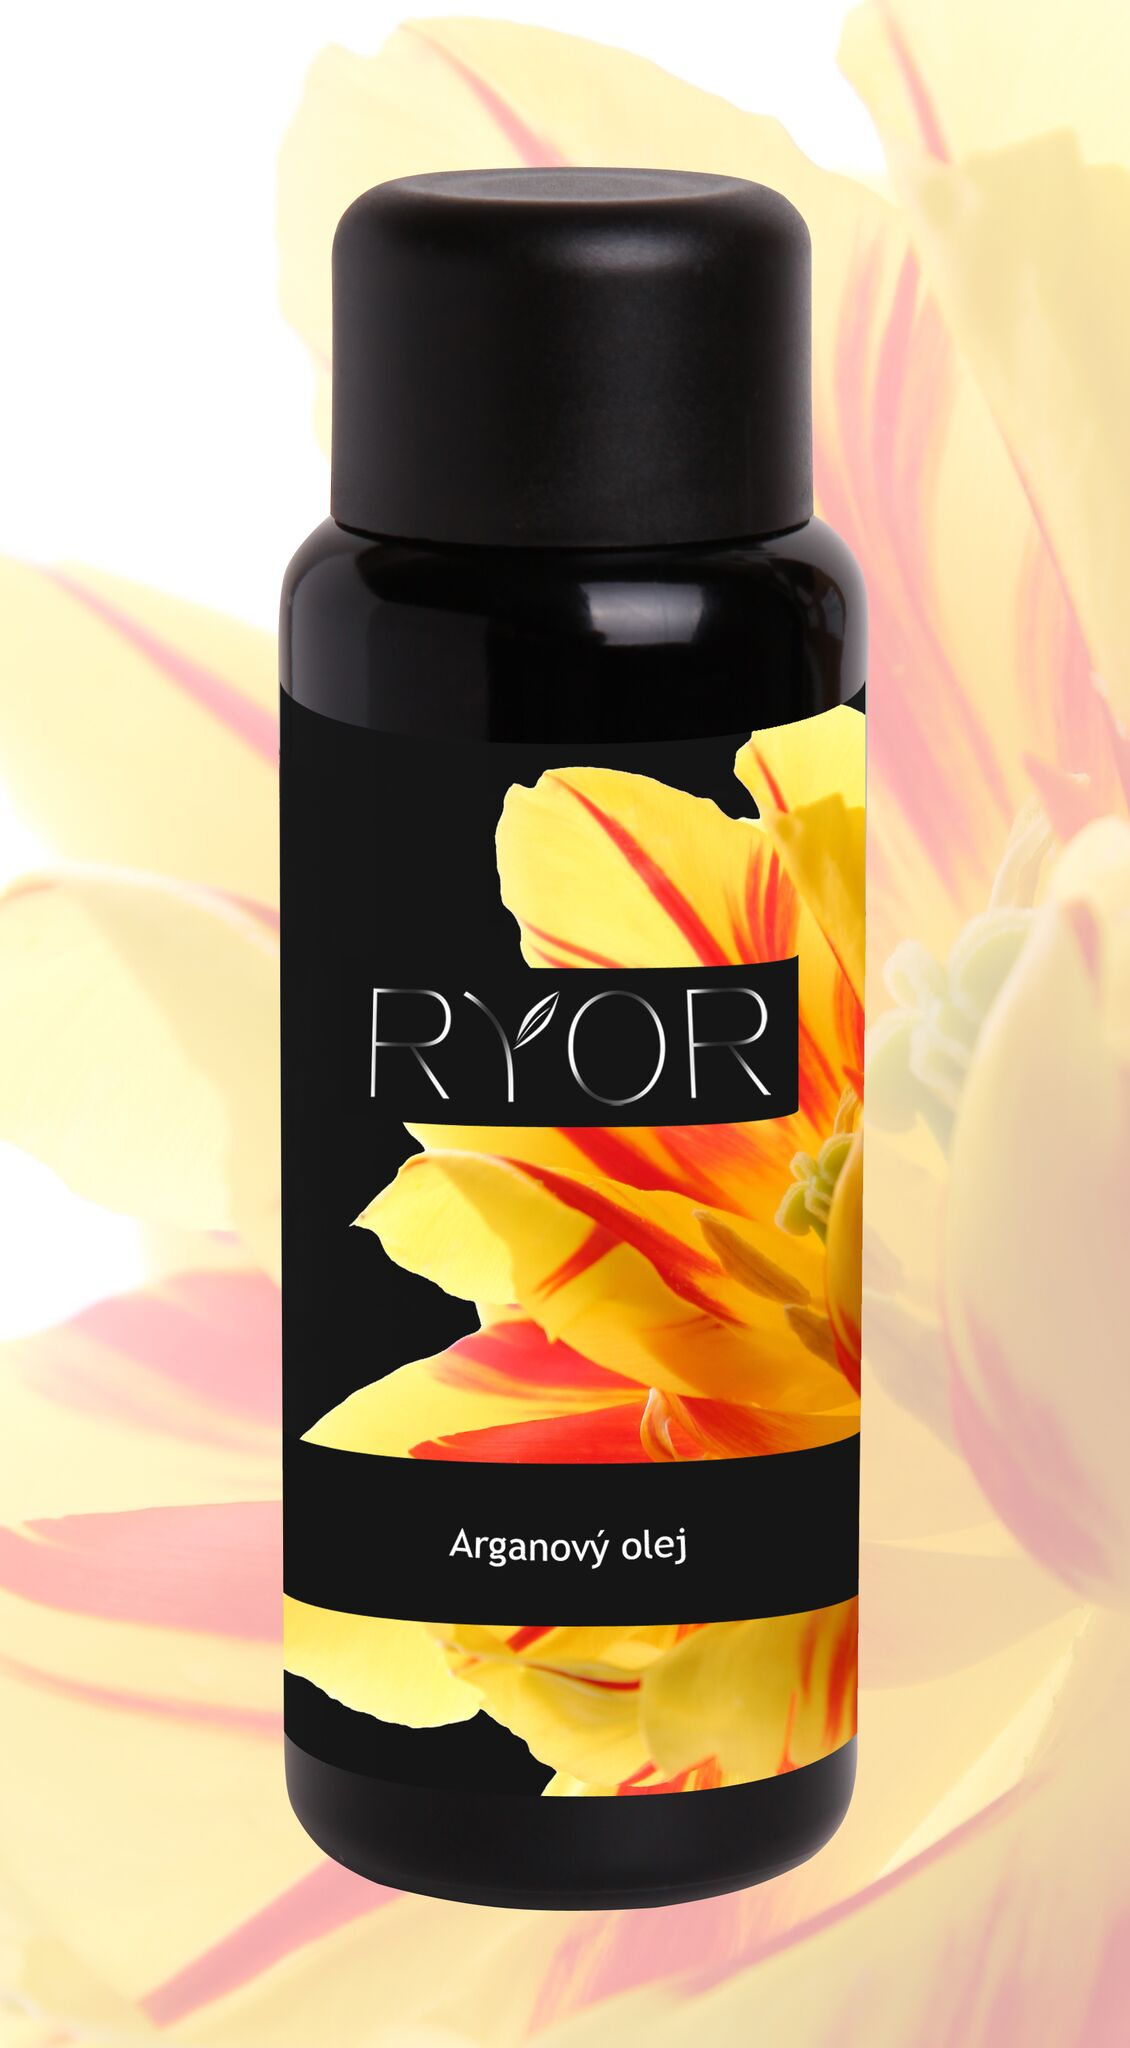 RYOR Arganový olej 100 ml